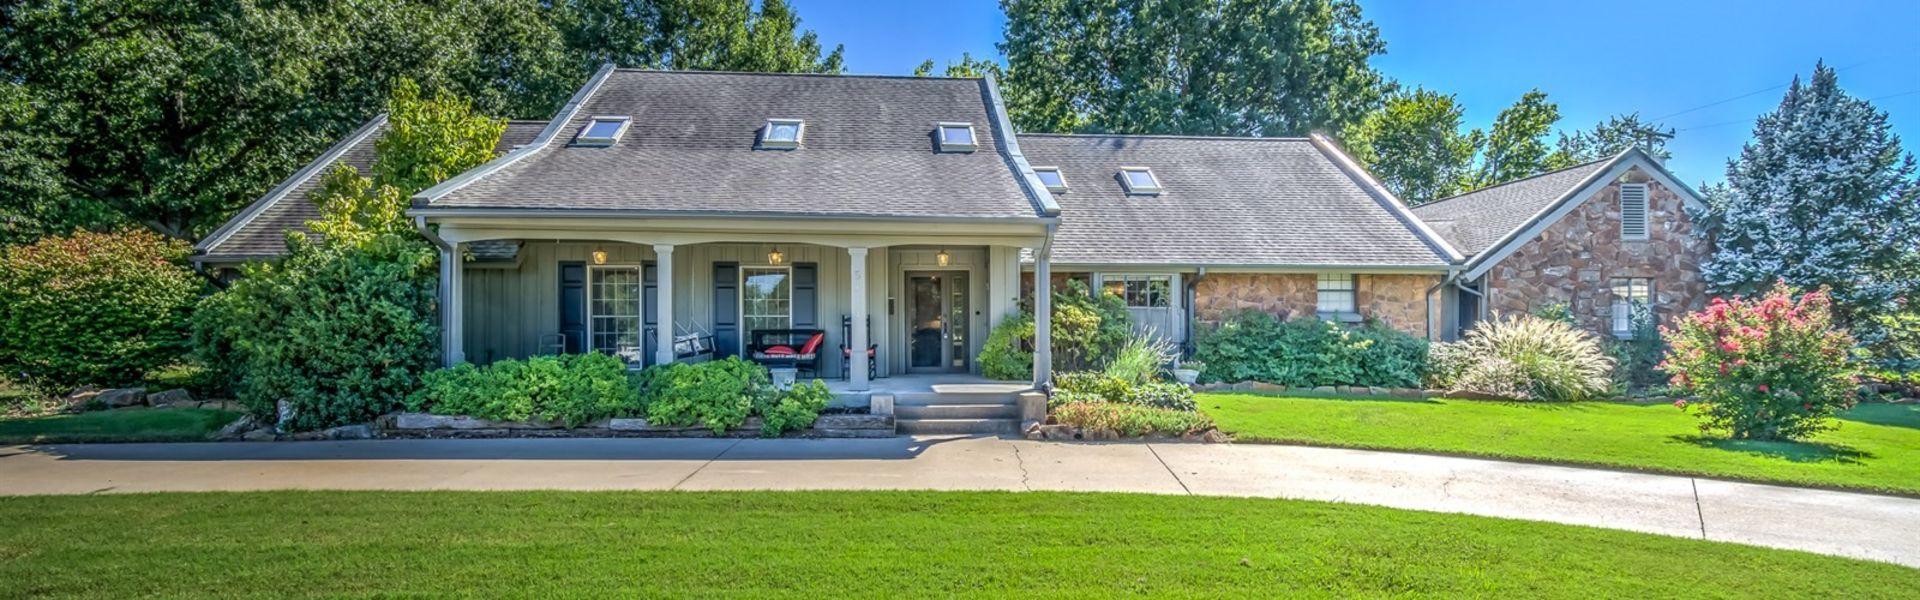 5111 Woodland Rd., Bartlesville, Oklahoma 74006